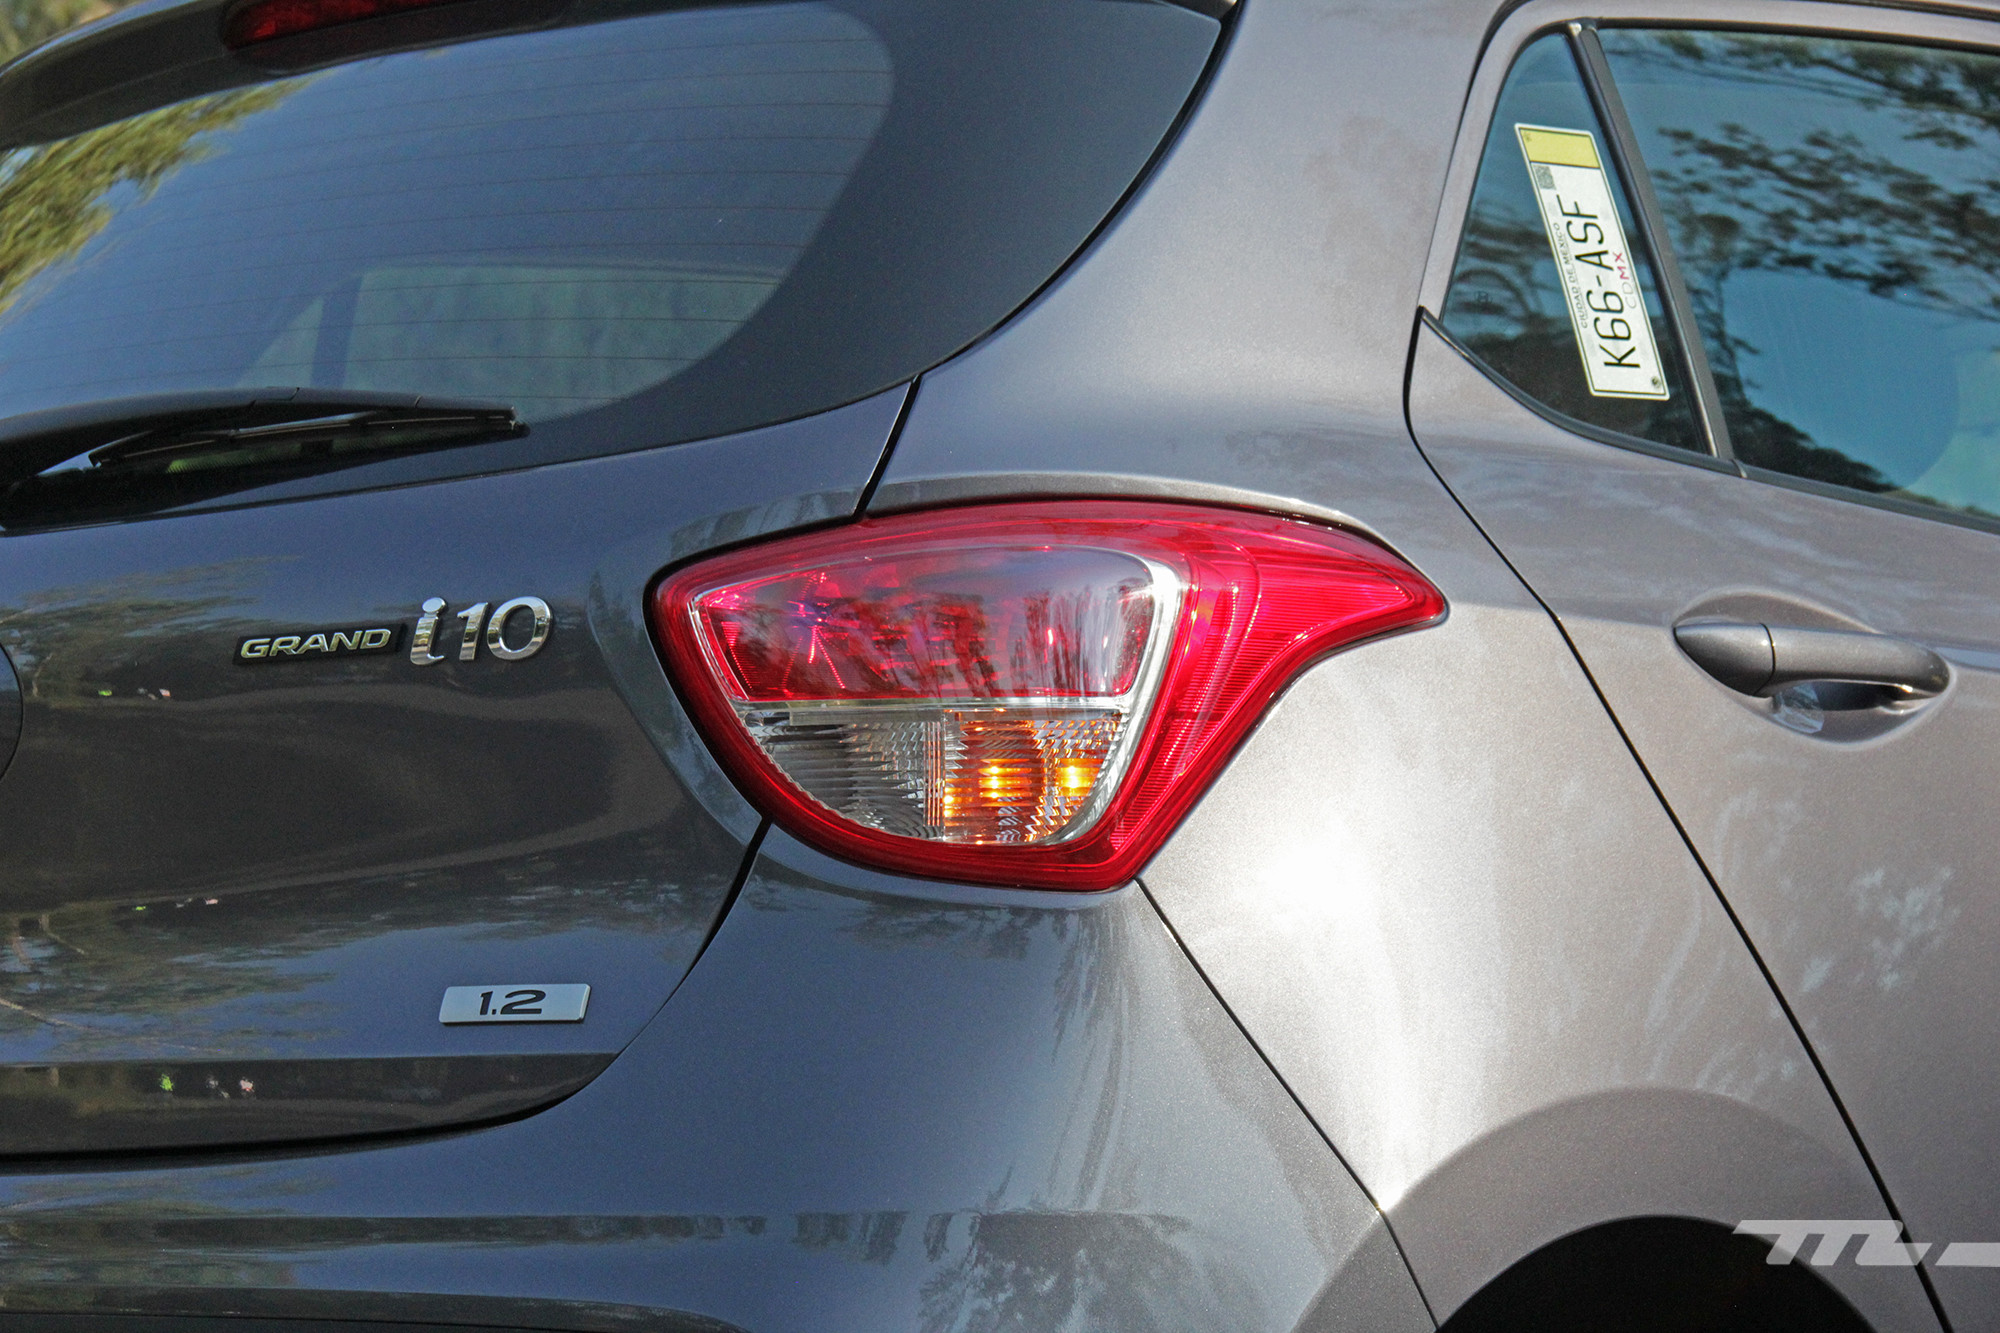 Foto de Hyundai i10 Grand Hatc (15/26)